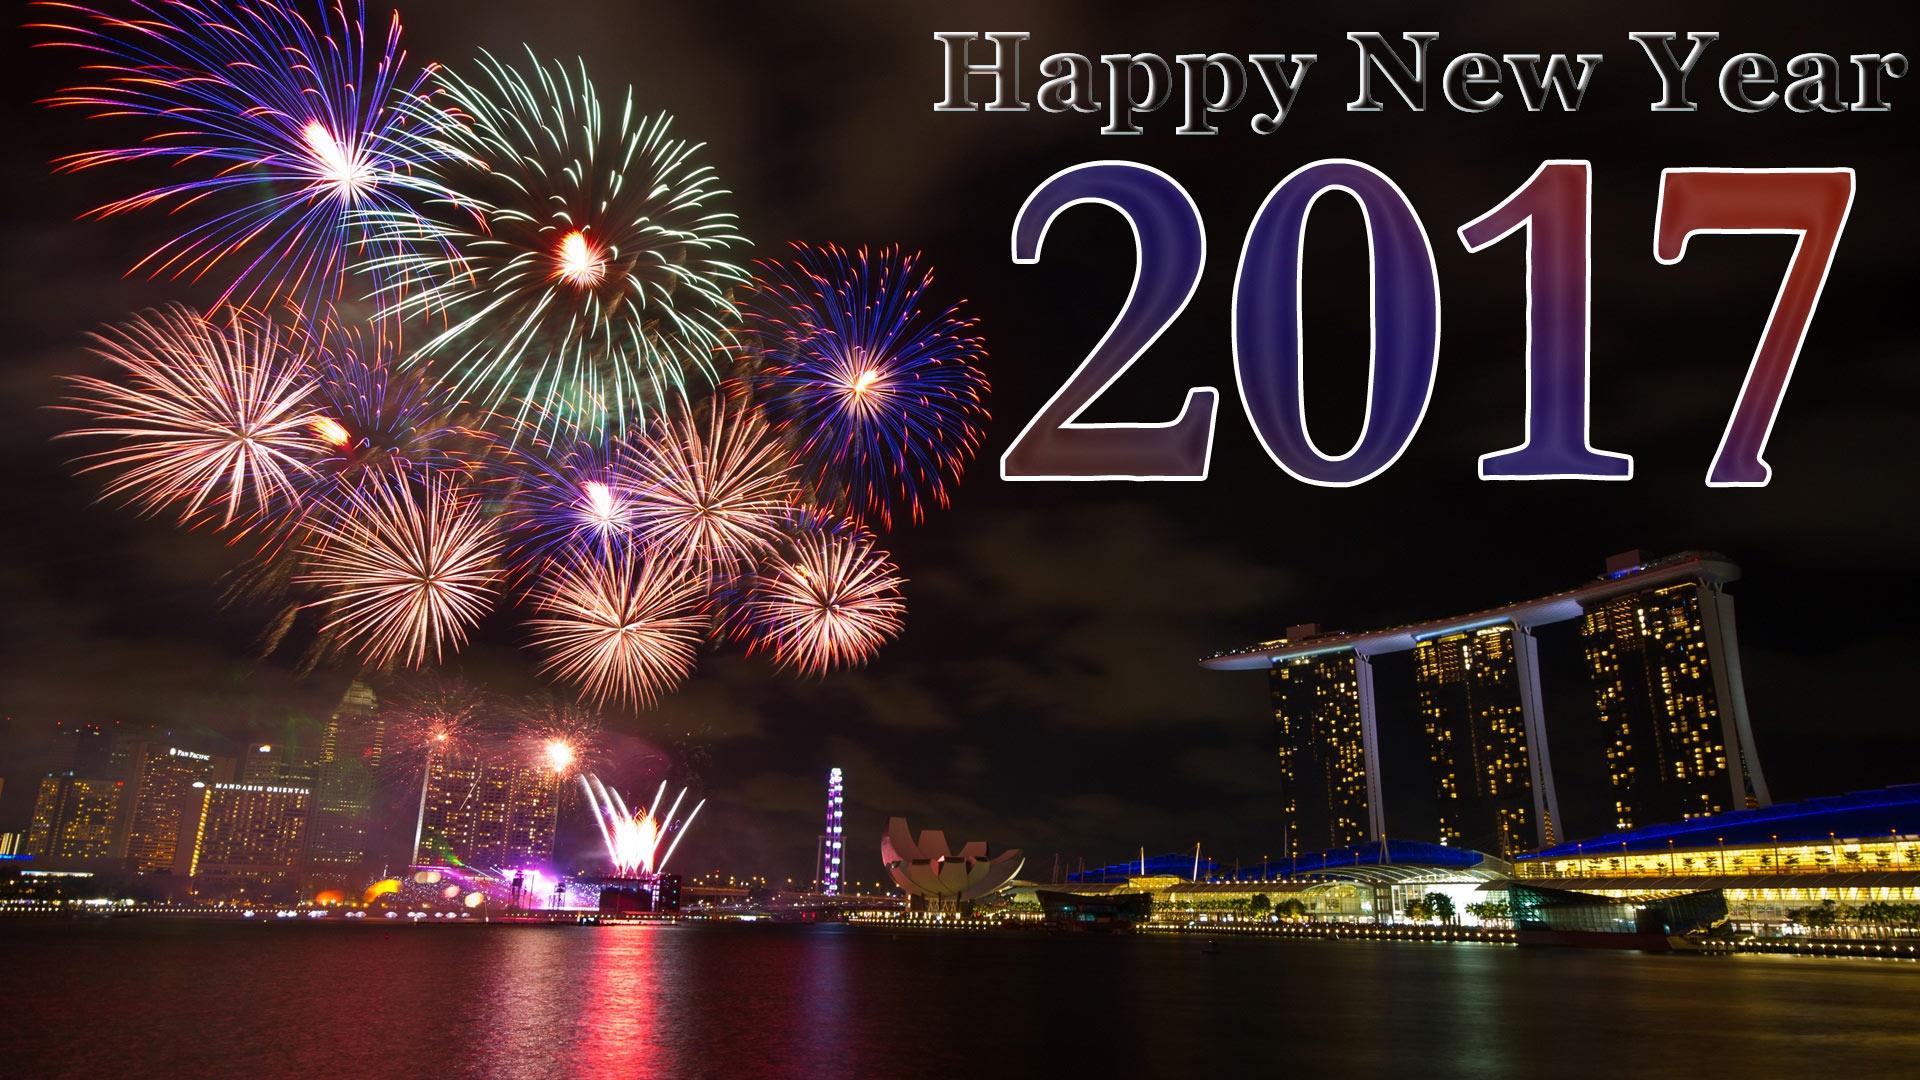 Free download Happy New Year 2017 wallpaper shinetalkscom